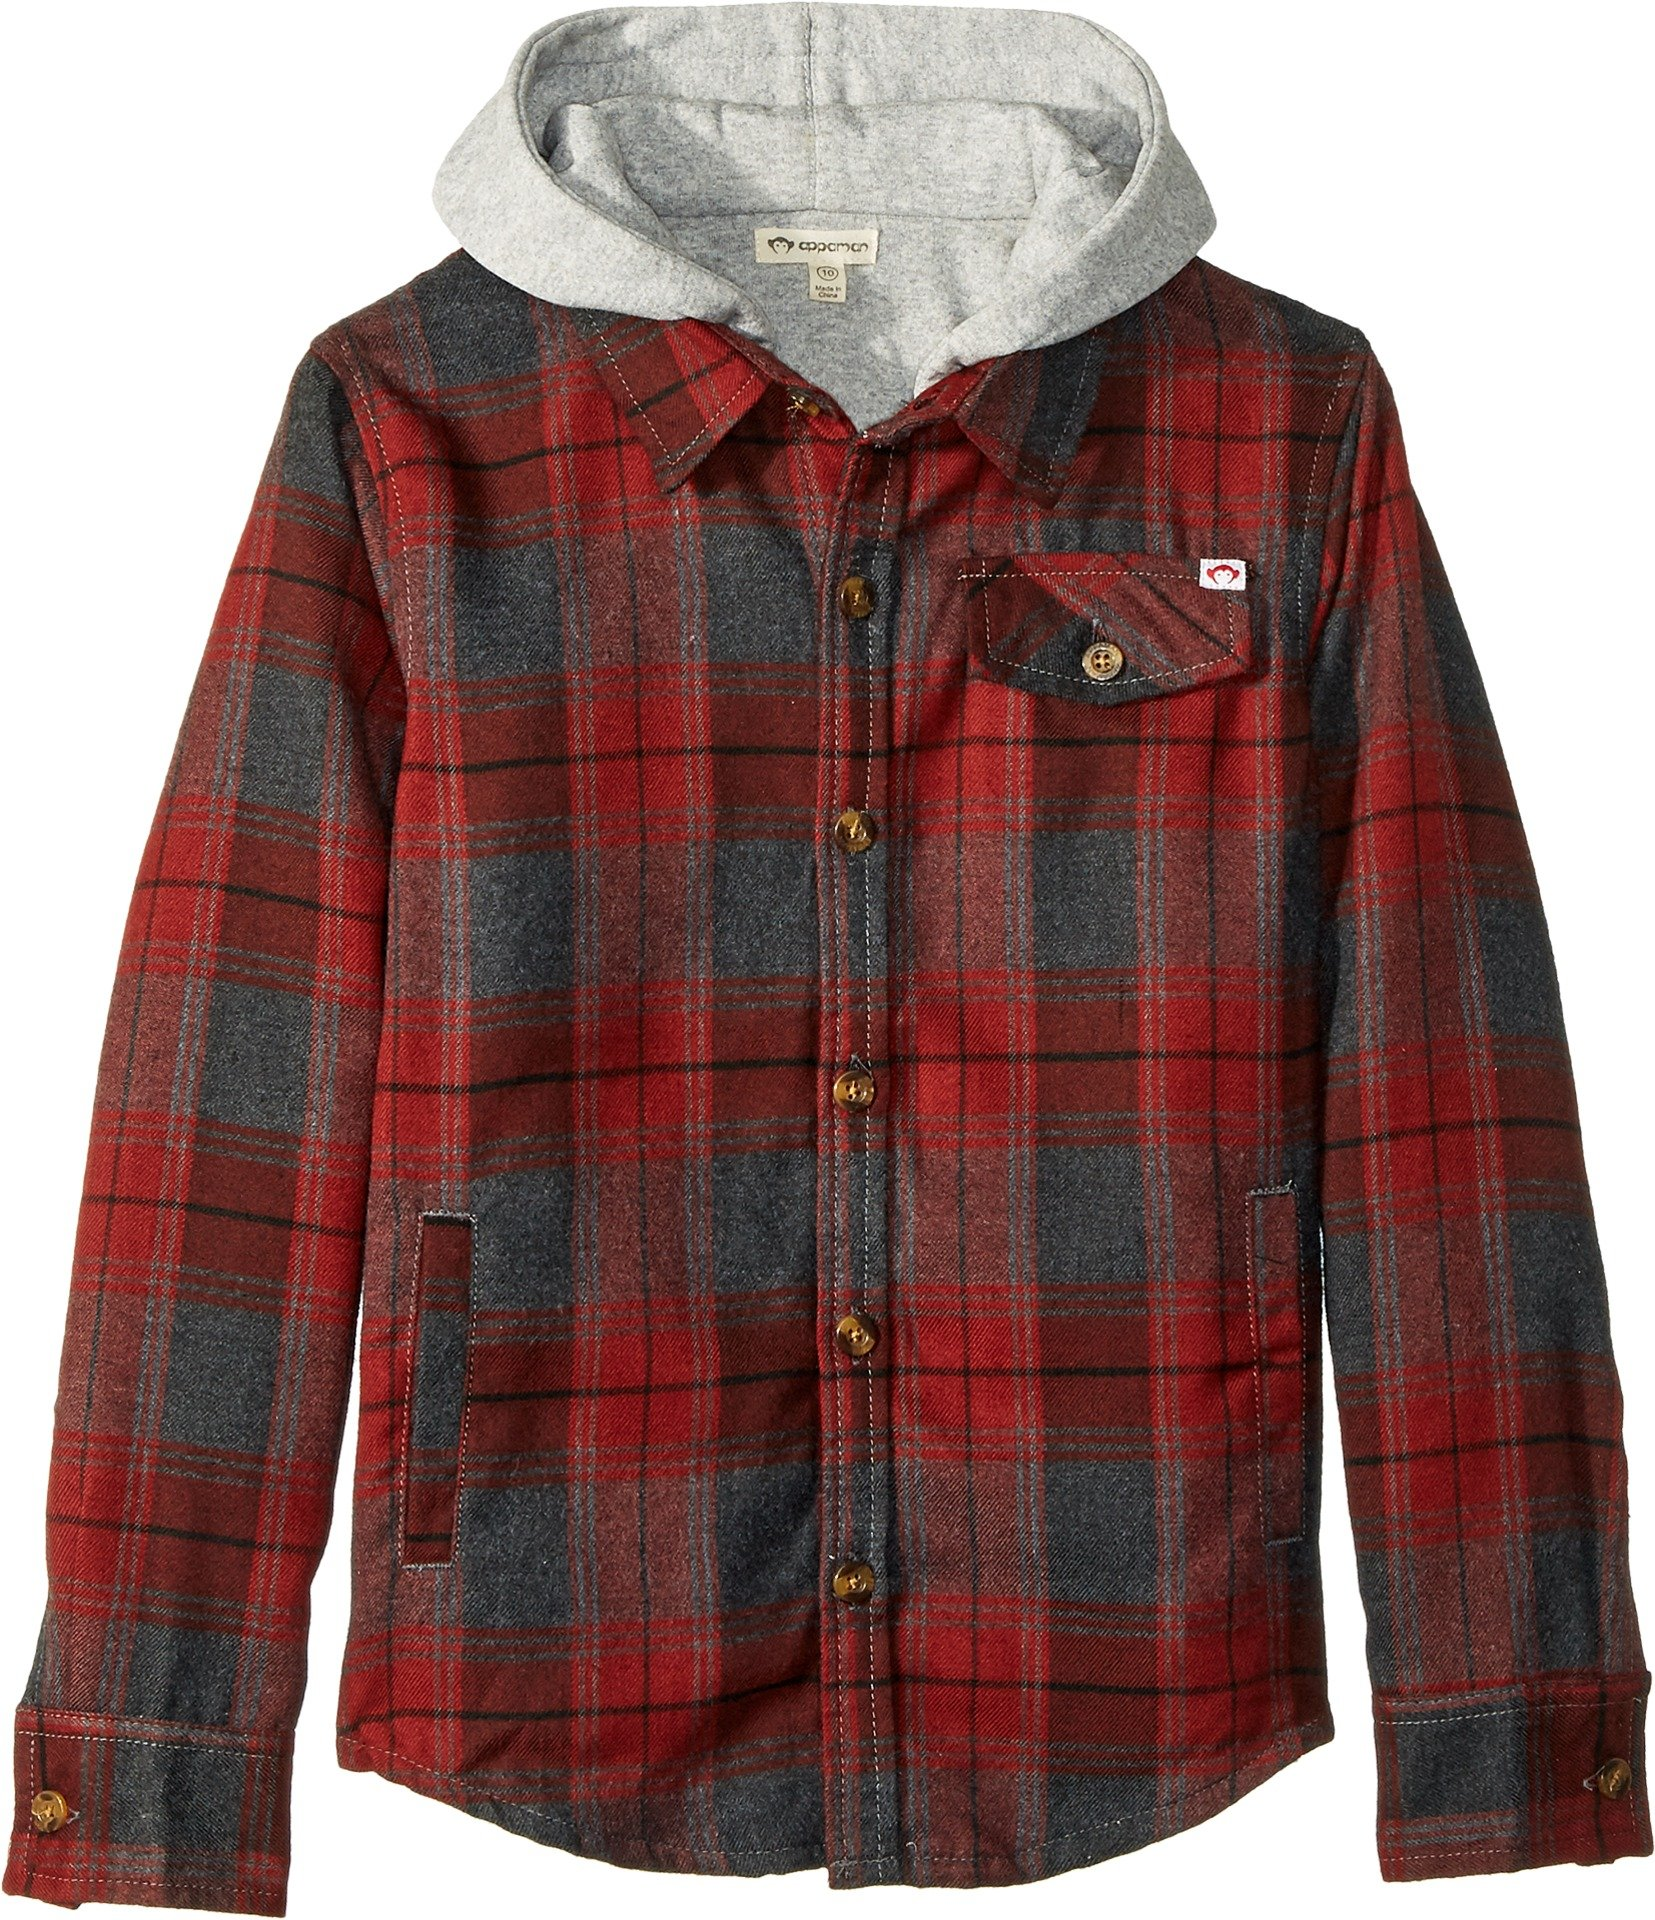 Appaman Kids  Baby Boy's Glen Flannel Hooded Jacket (Toddler/Little Kids/Big Kids) Sidewalk Plaid 4 US Toddler